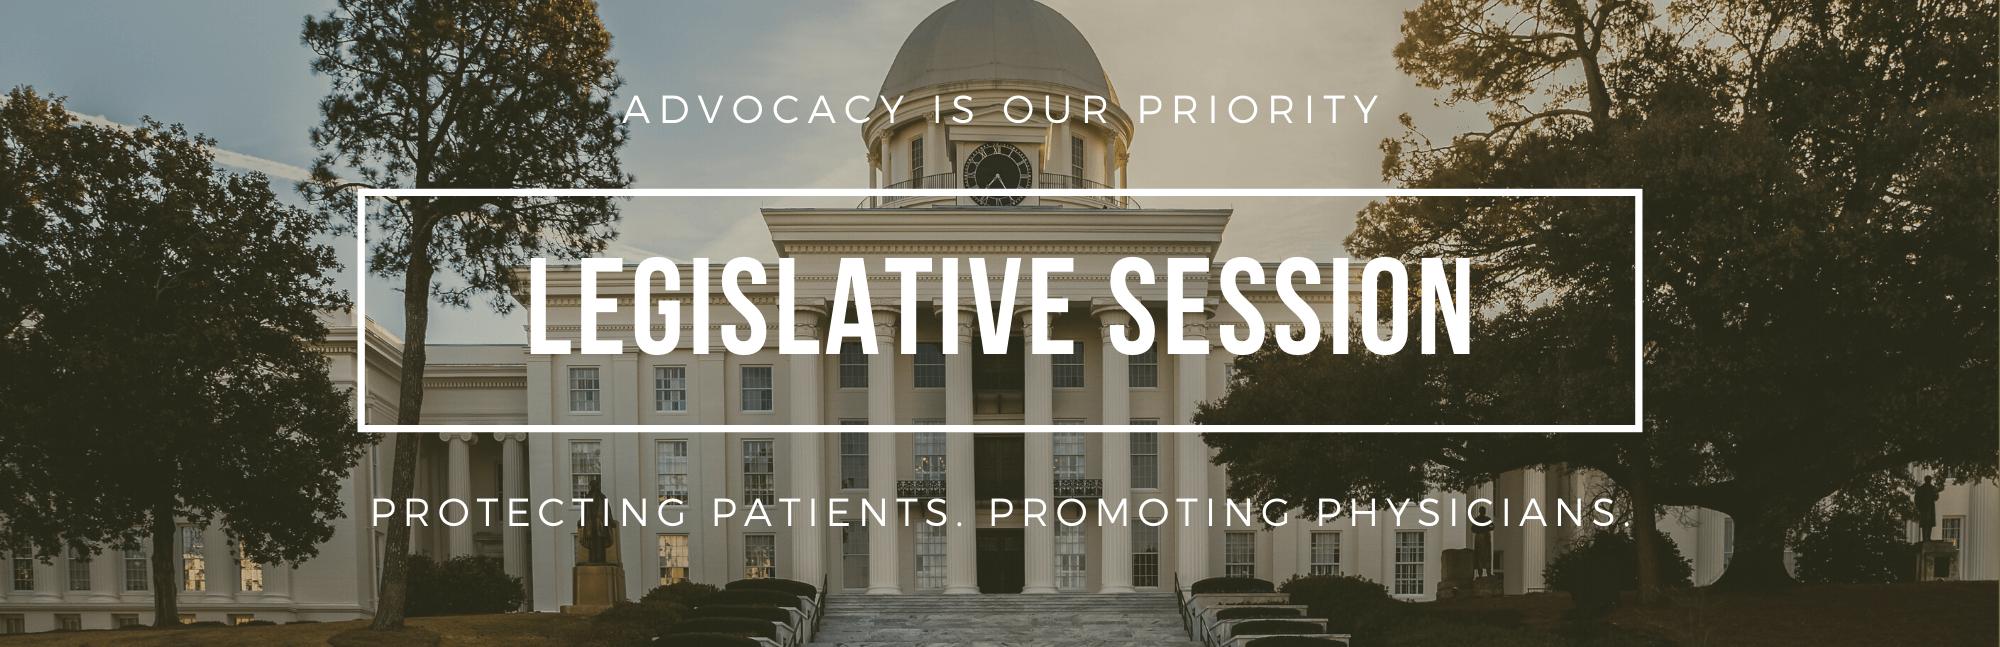 2020-Advocacy-Legislative-Mission_Statement